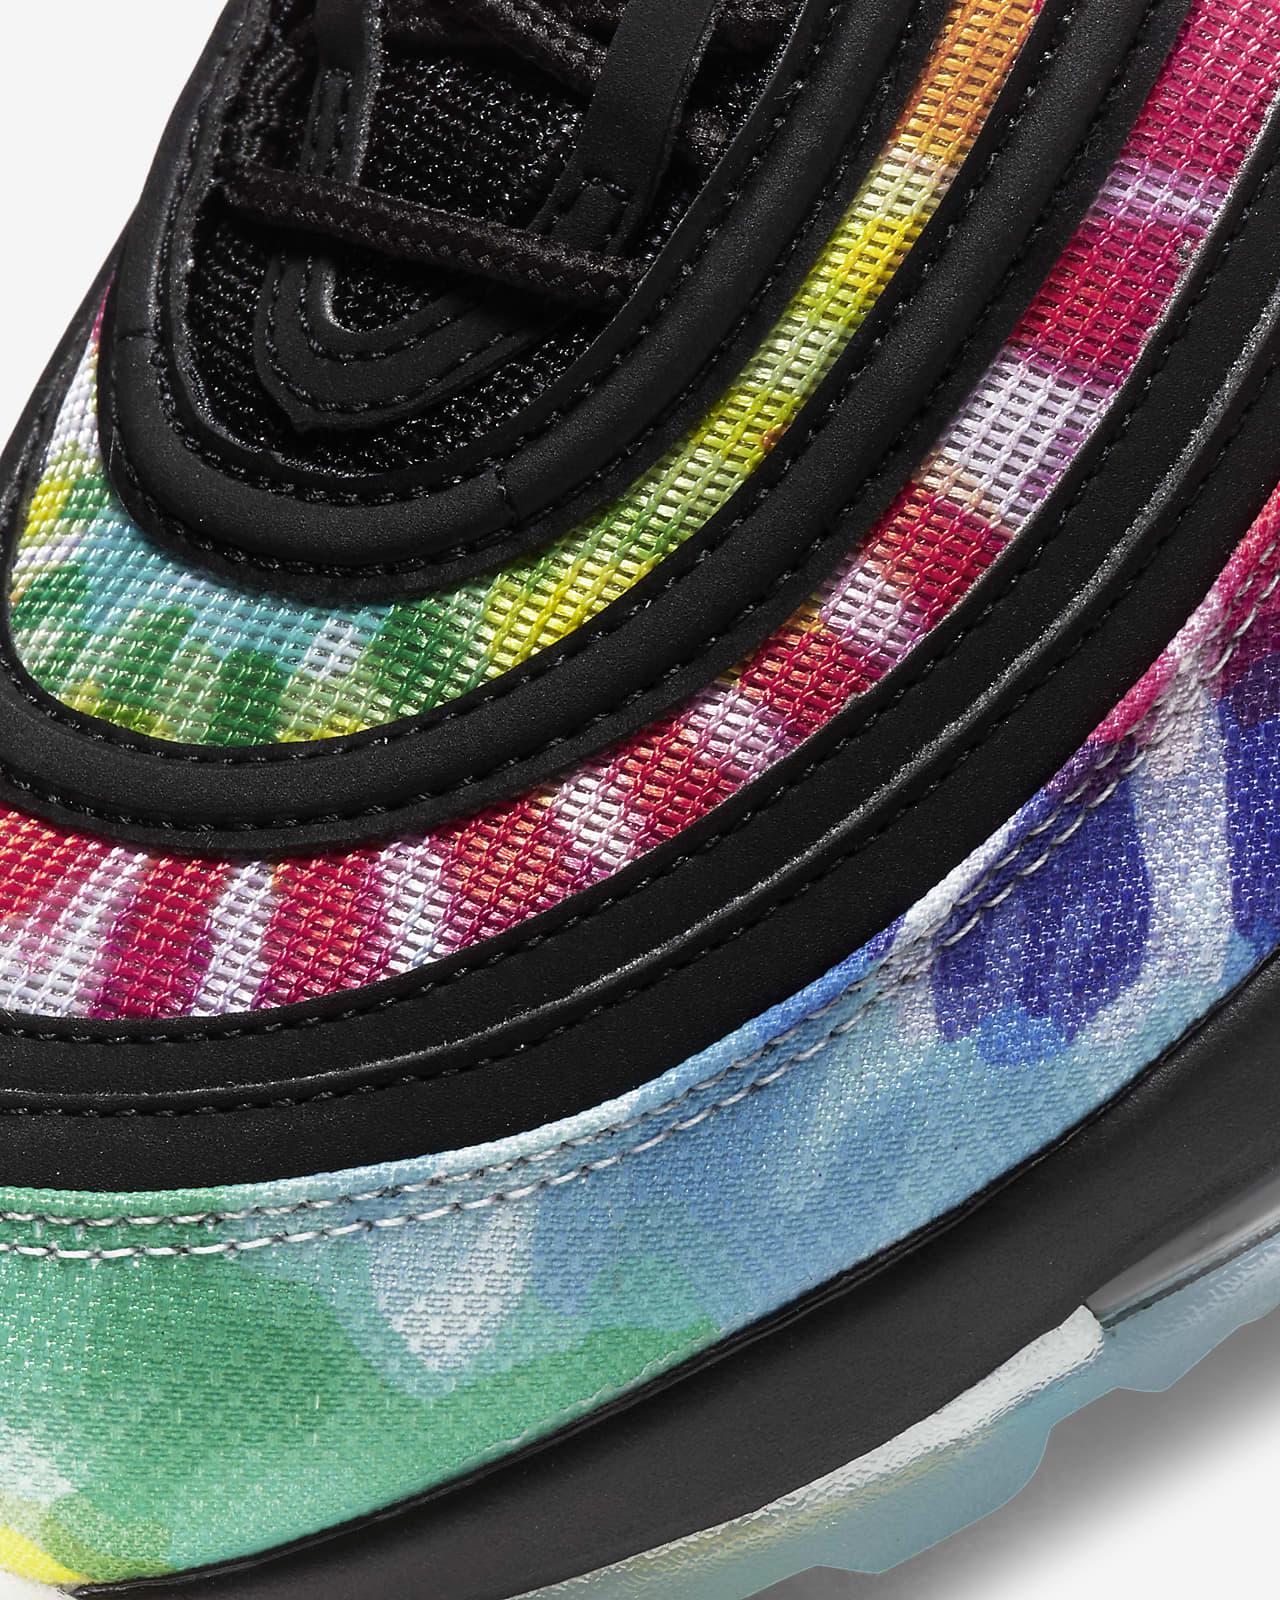 Nike Air Max 97 G NRG Golf Shoes. Nike JP